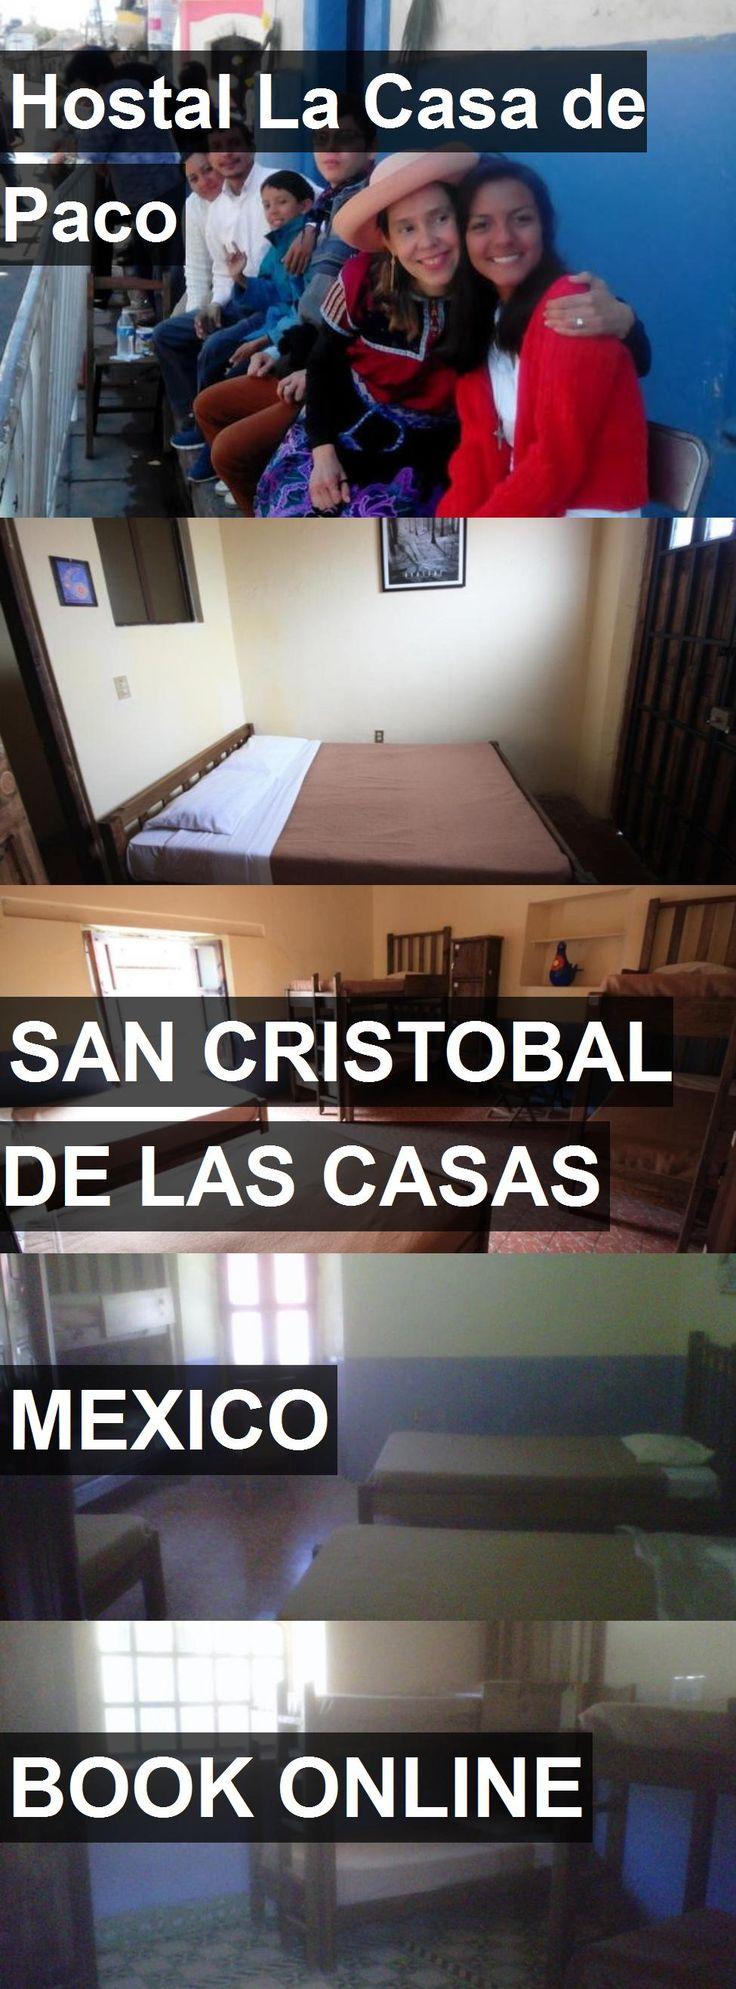 Hotel Hostal La Casa de Paco in San Cristobal de las Casas, Mexico. For more information, photos, reviews and best prices please follow the link. #Mexico #SanCristobaldelasCasas #HostalLaCasadePaco #hotel #travel #vacation